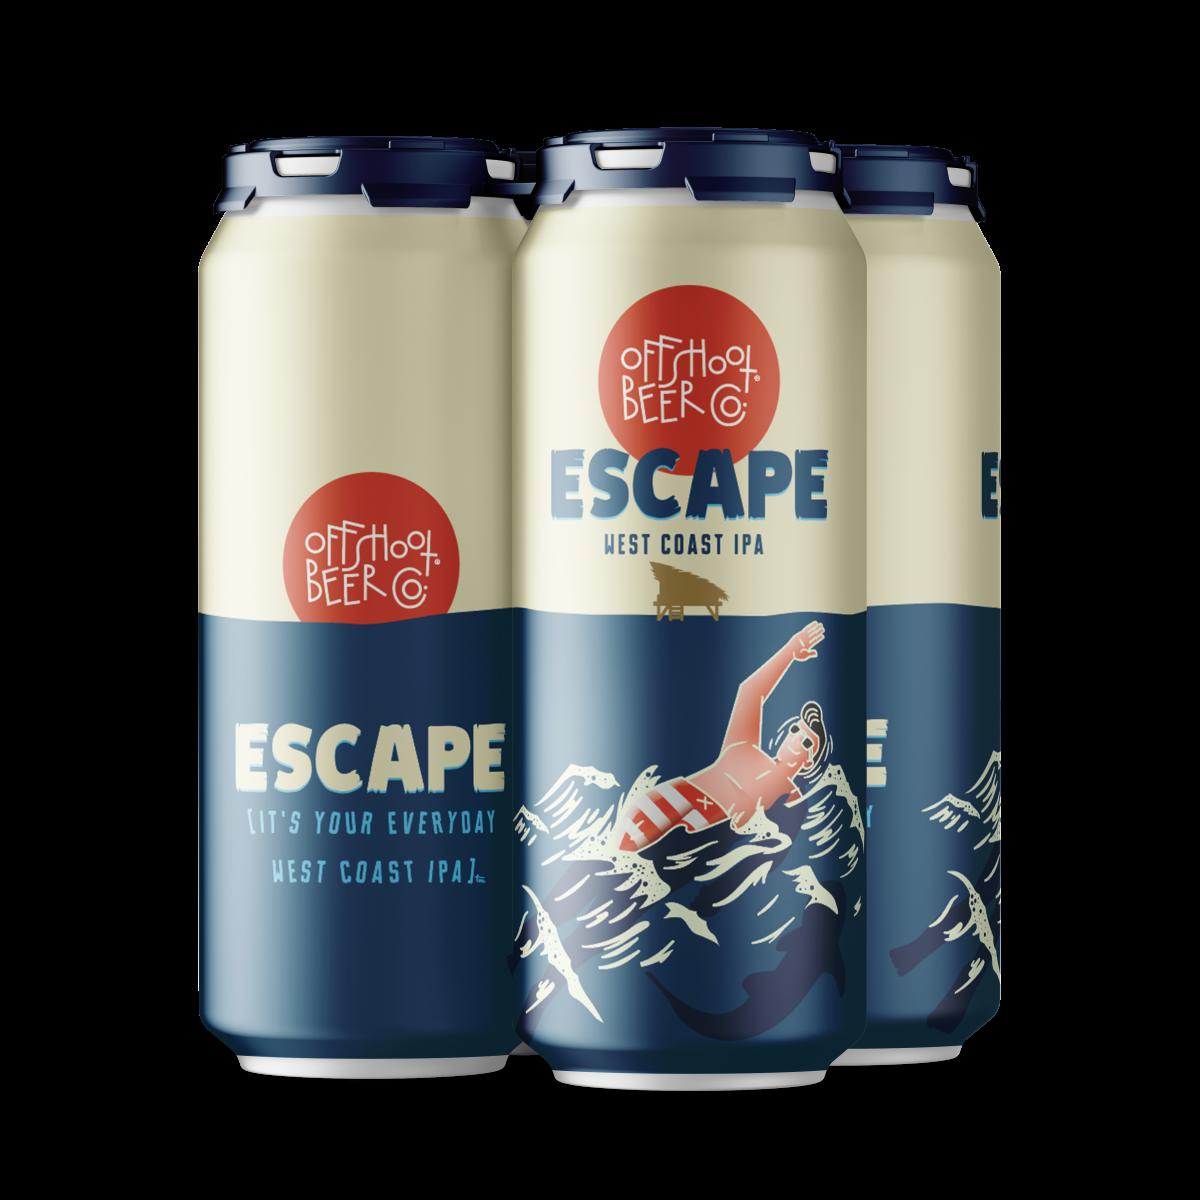 Offshoot Beer Co. Escape West Coast IPA